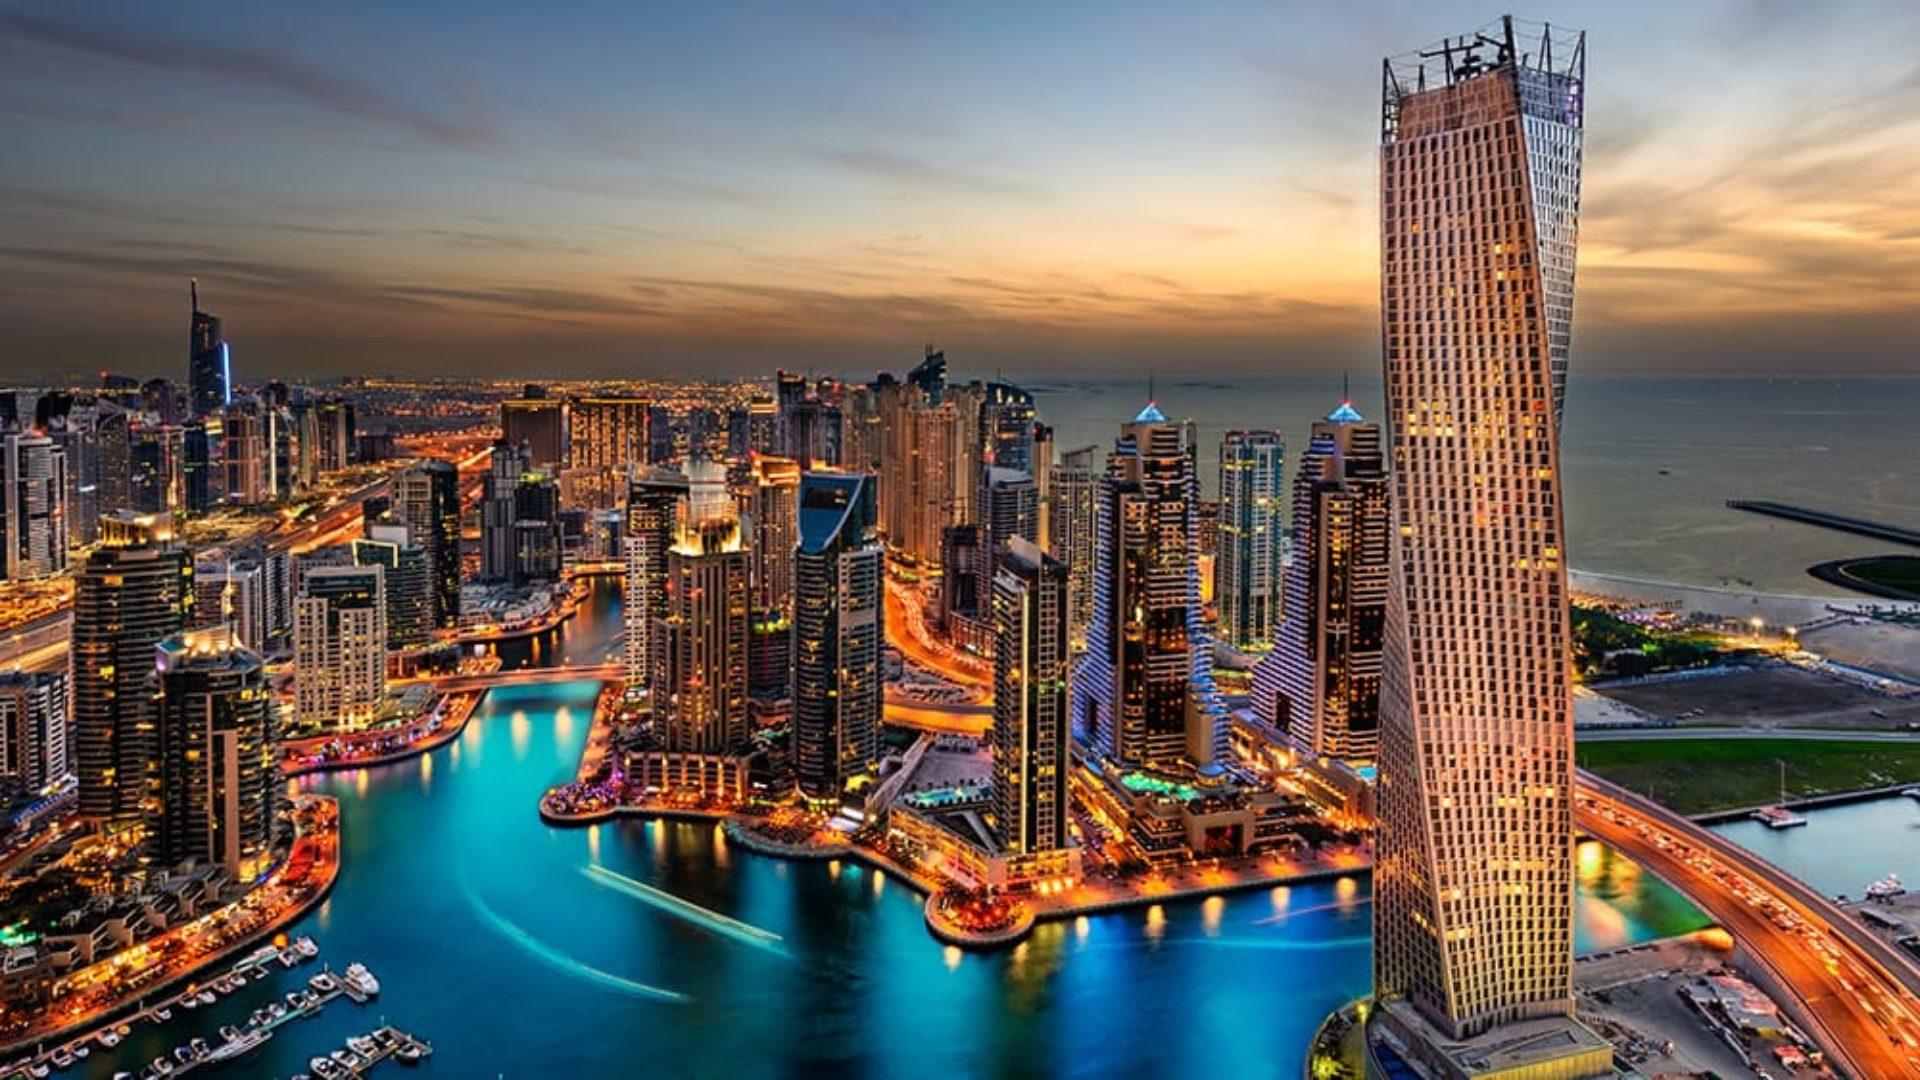 Aerial view of Dubai on a Mauritius & Dubai twin-centre